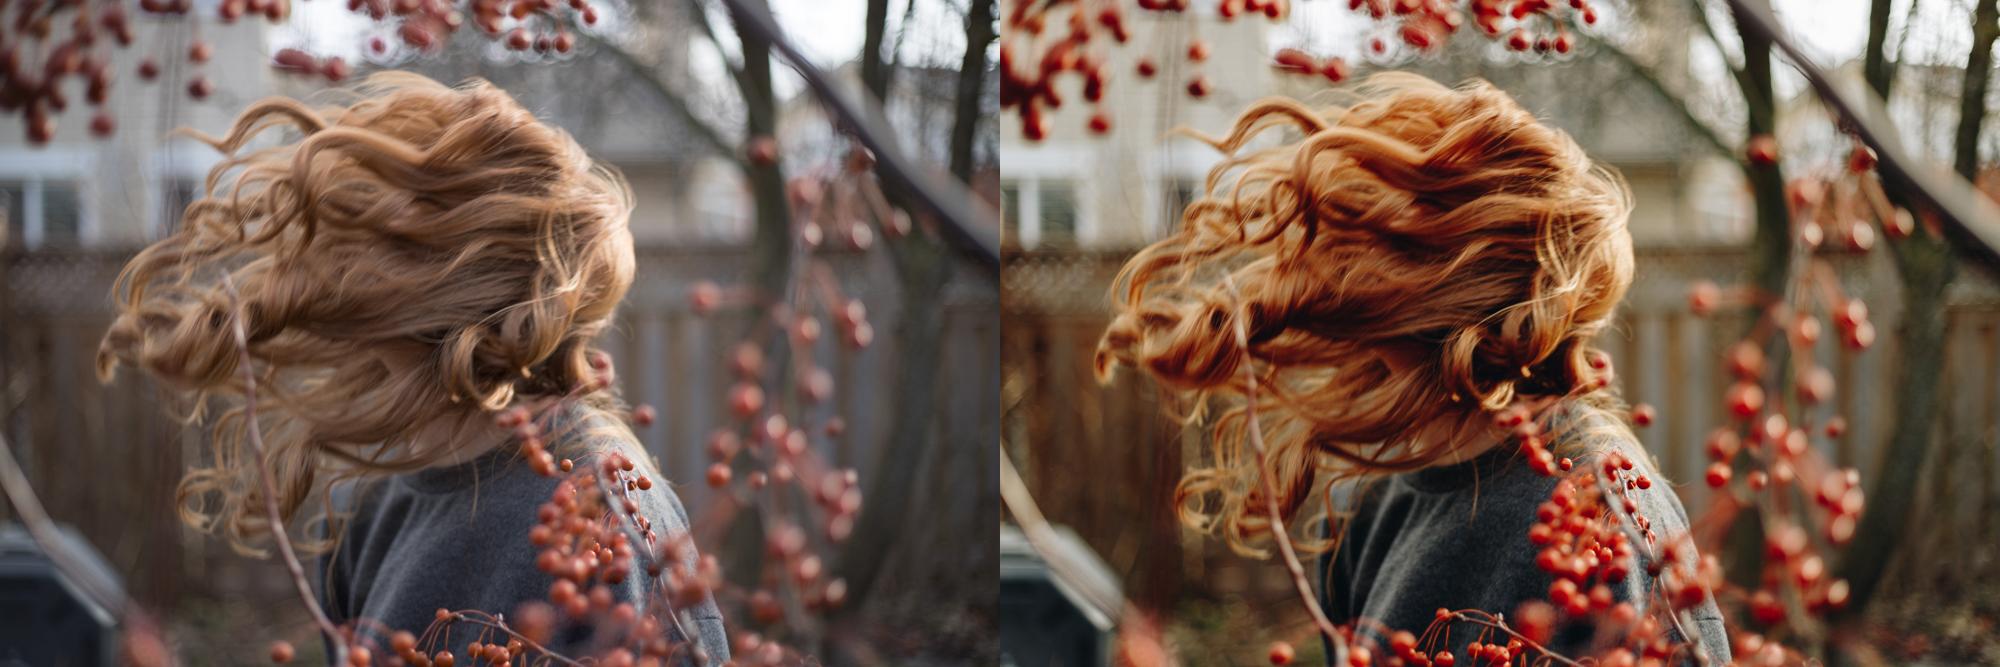 Megan Breukelman Fall Day 3.jpg